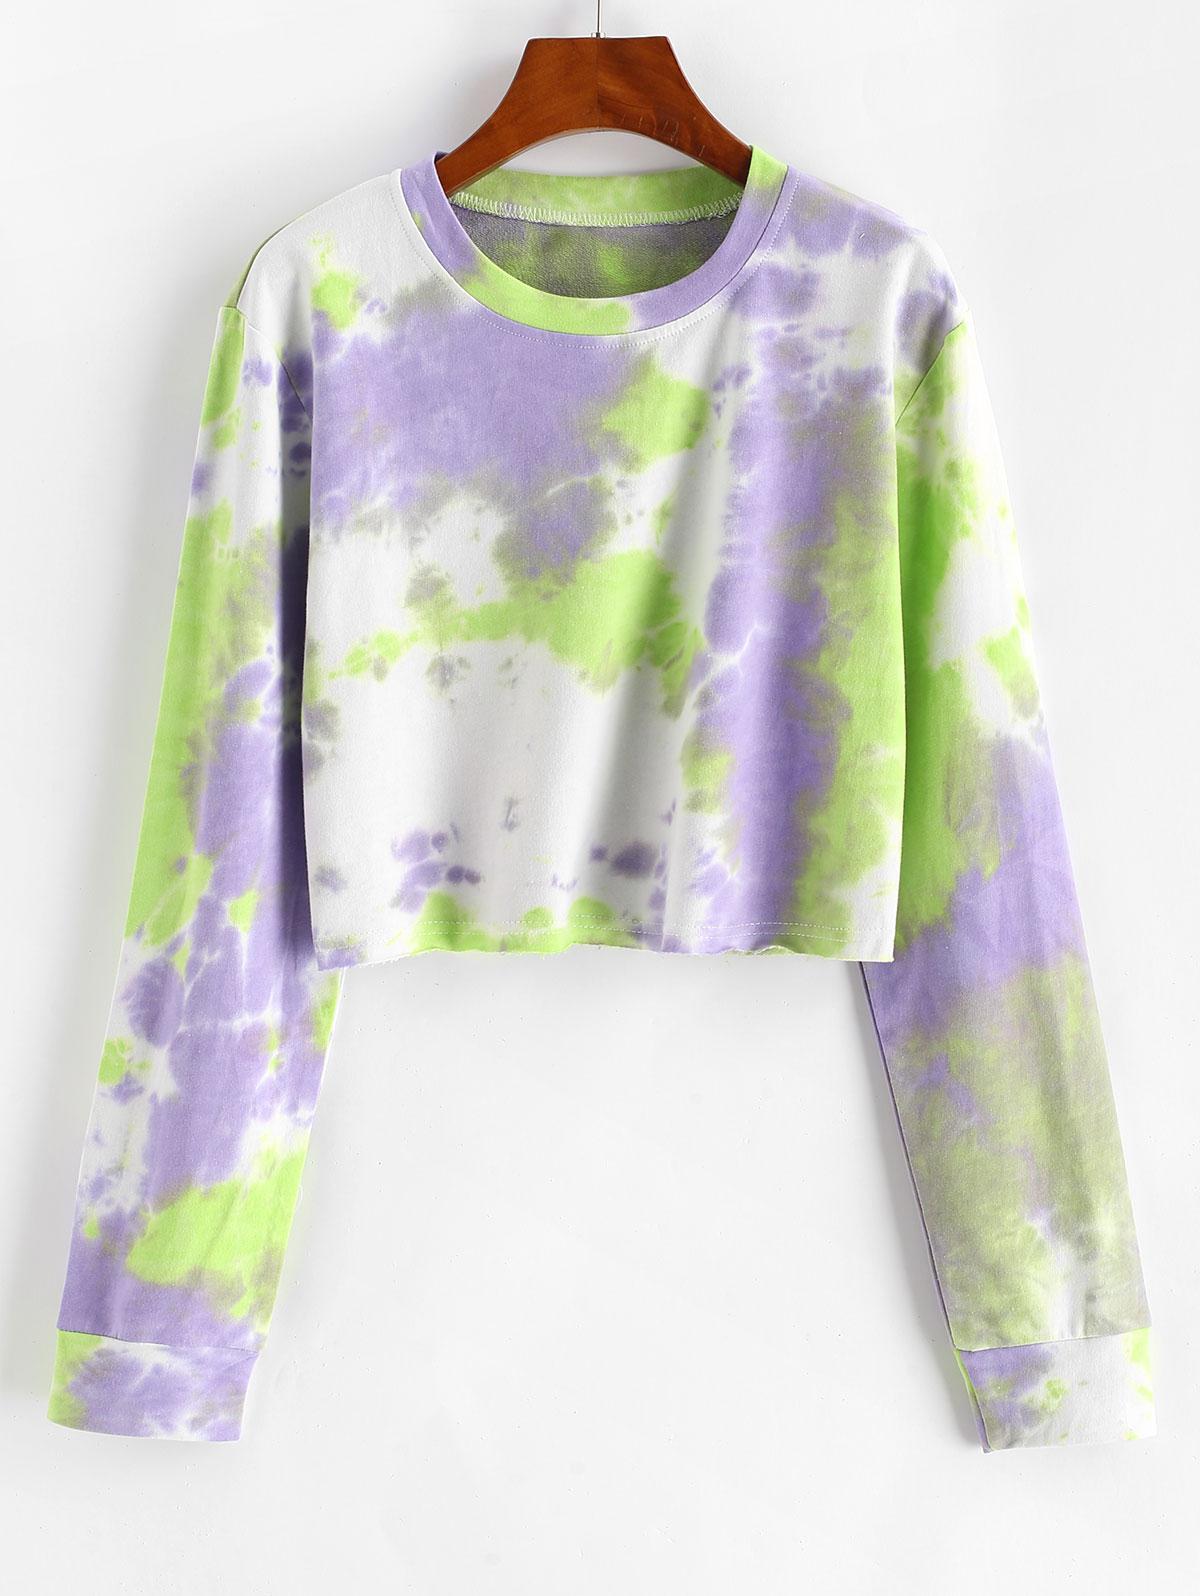 Sweat-shirt Court Teinté Imprimé L - Zaful FR - Modalova